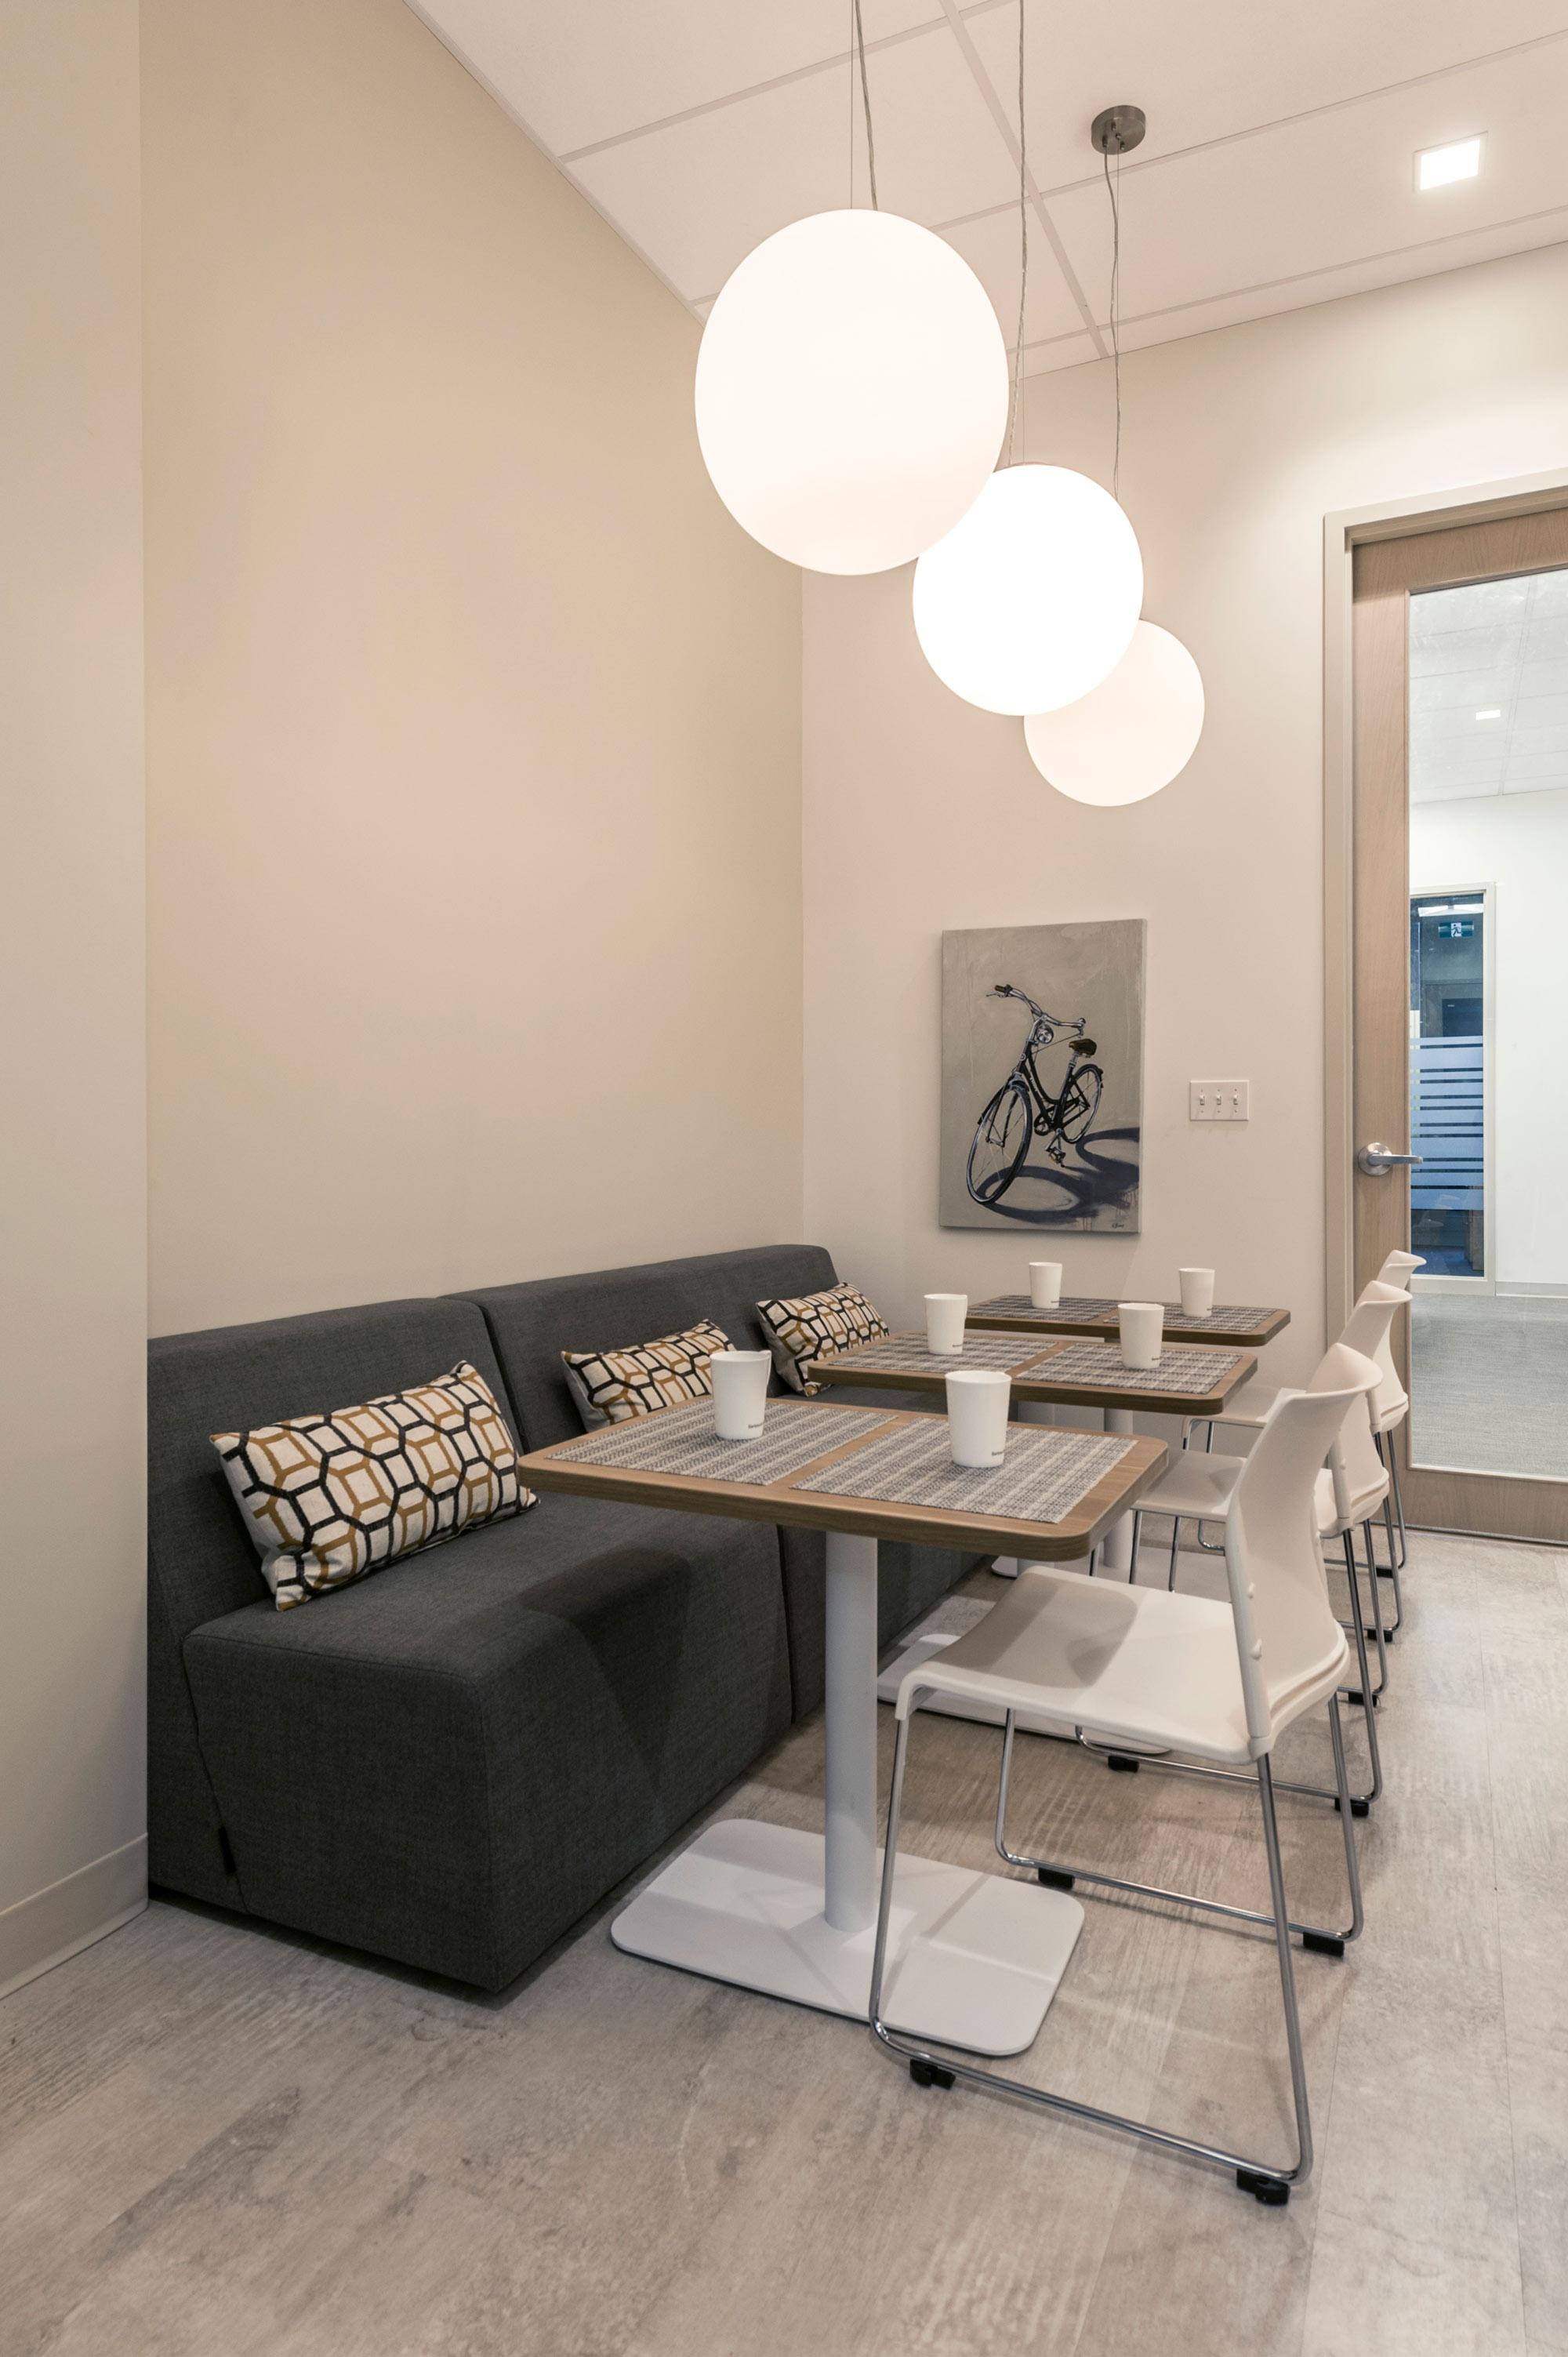 interior-design-legal-office-kitchen-seating.jpg